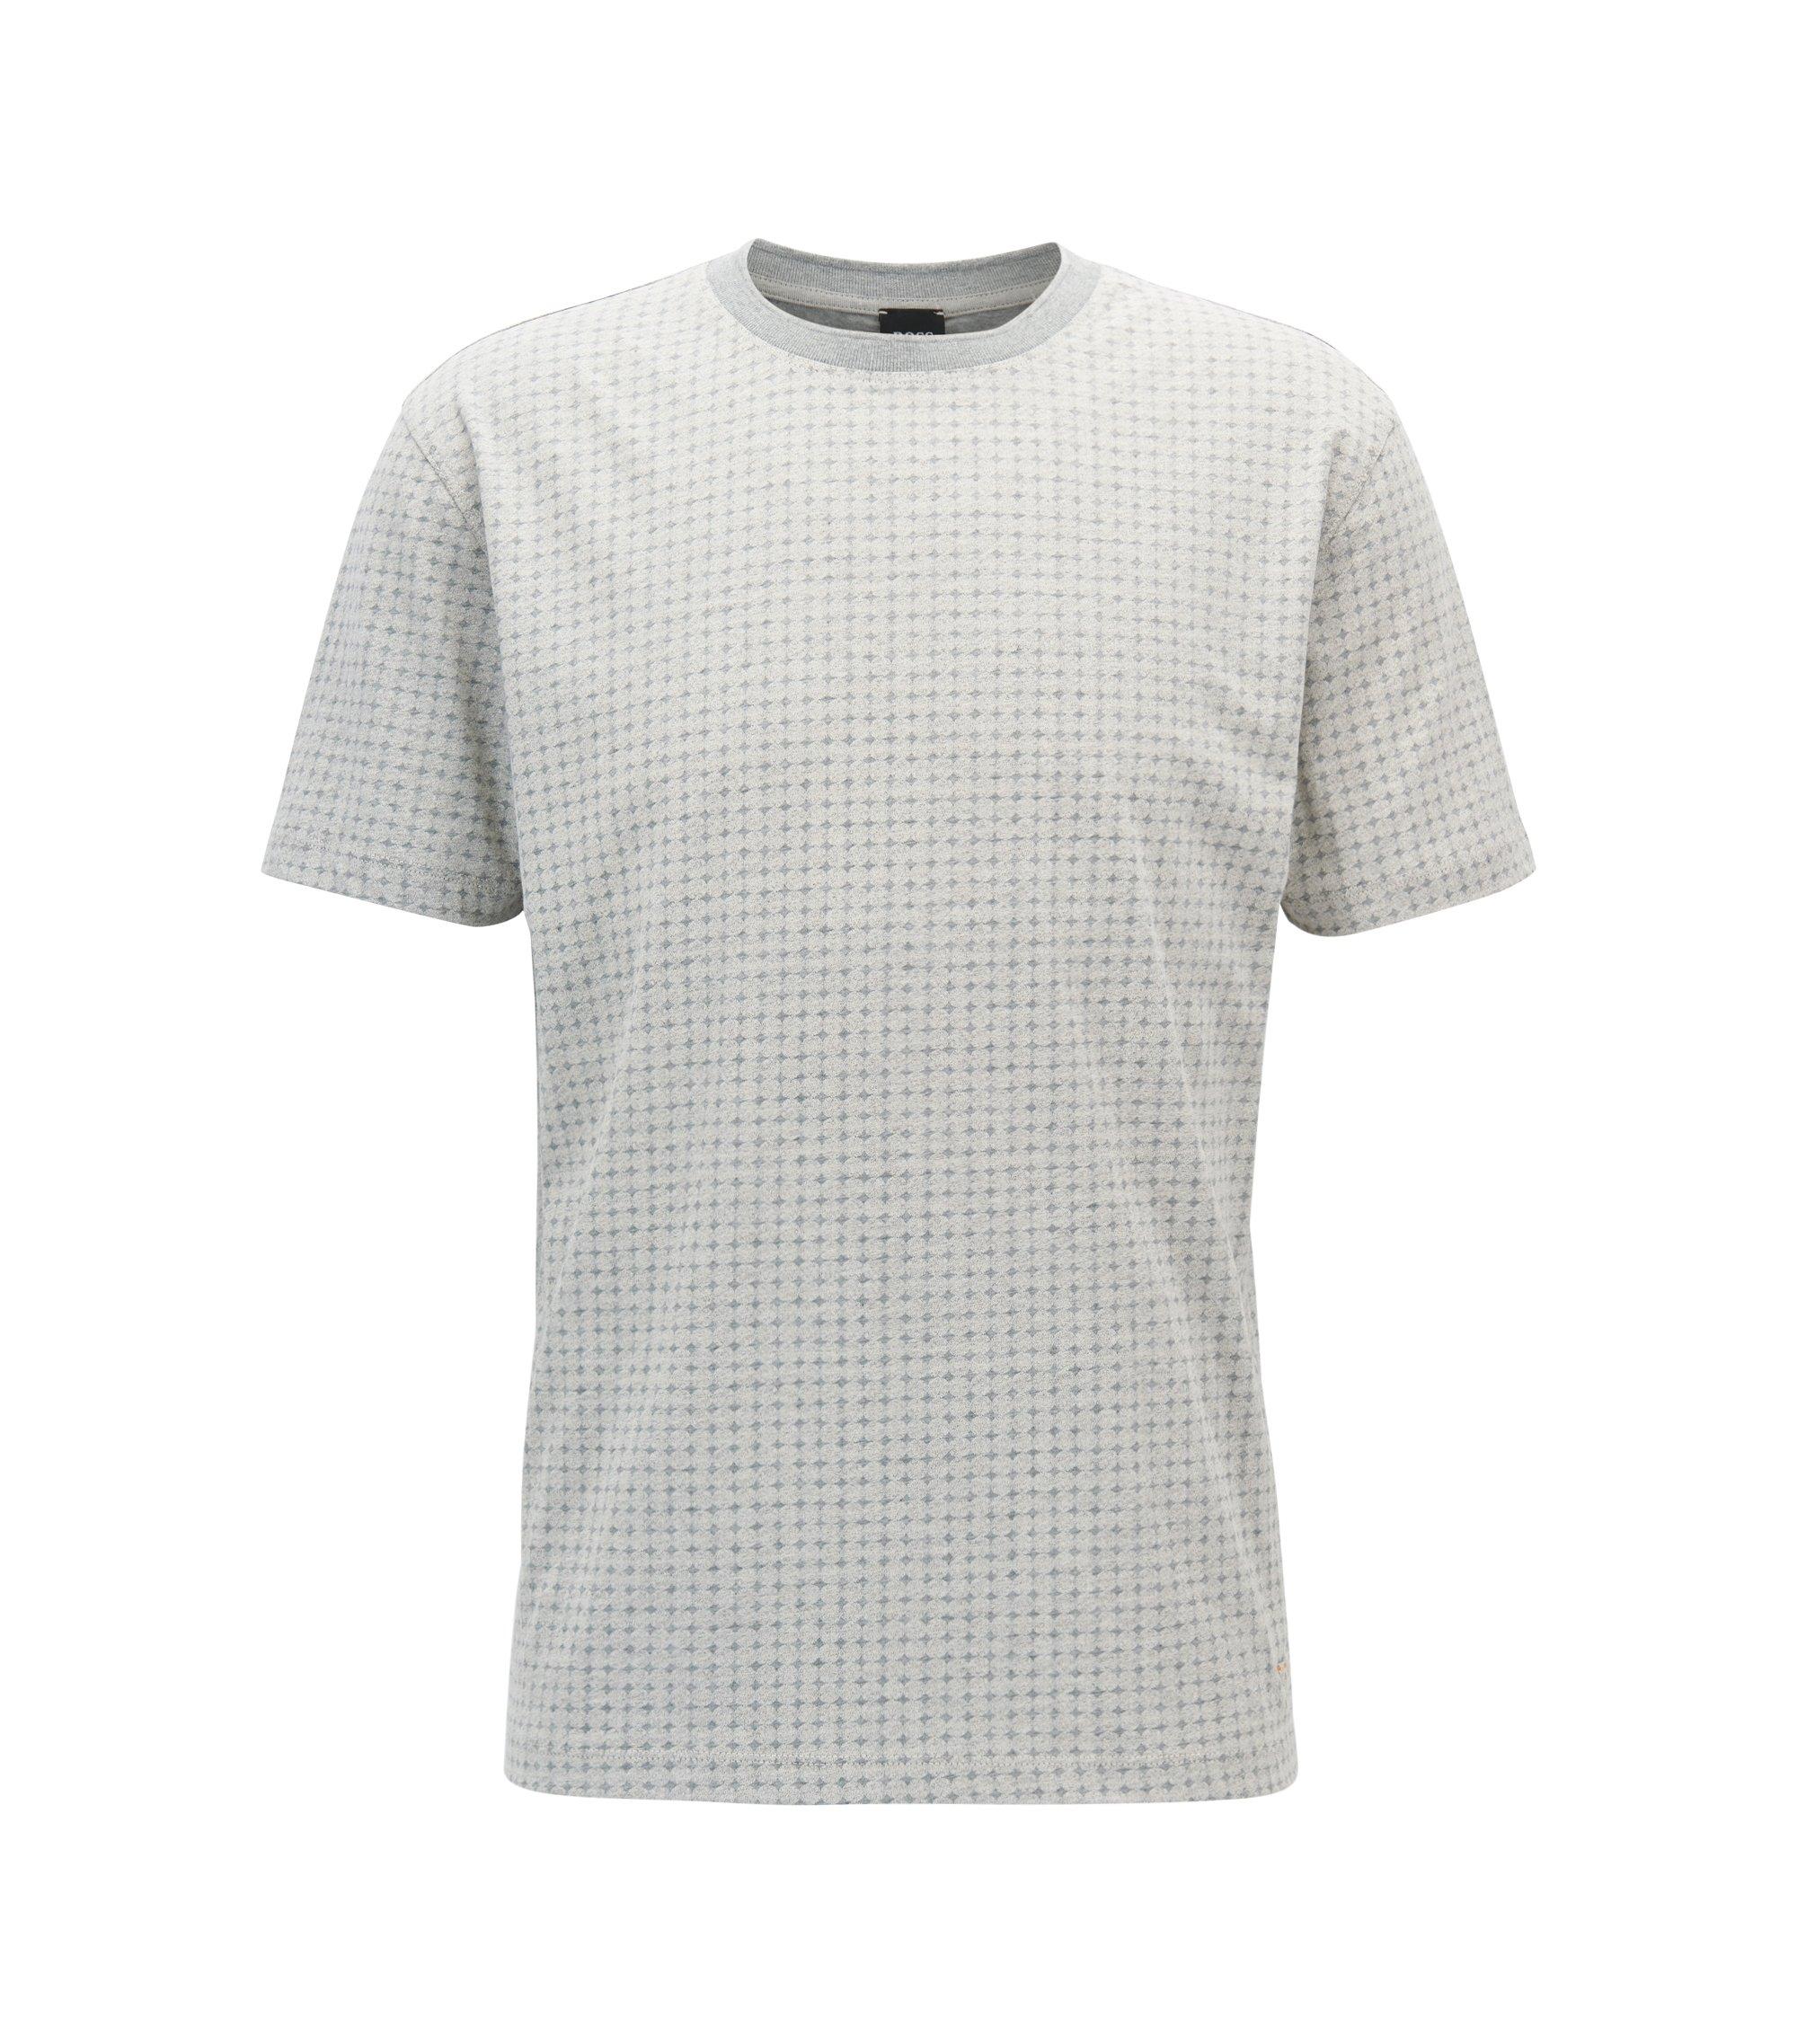 Camiseta relaxed fit en punto de algodón de fantasía, Gris claro